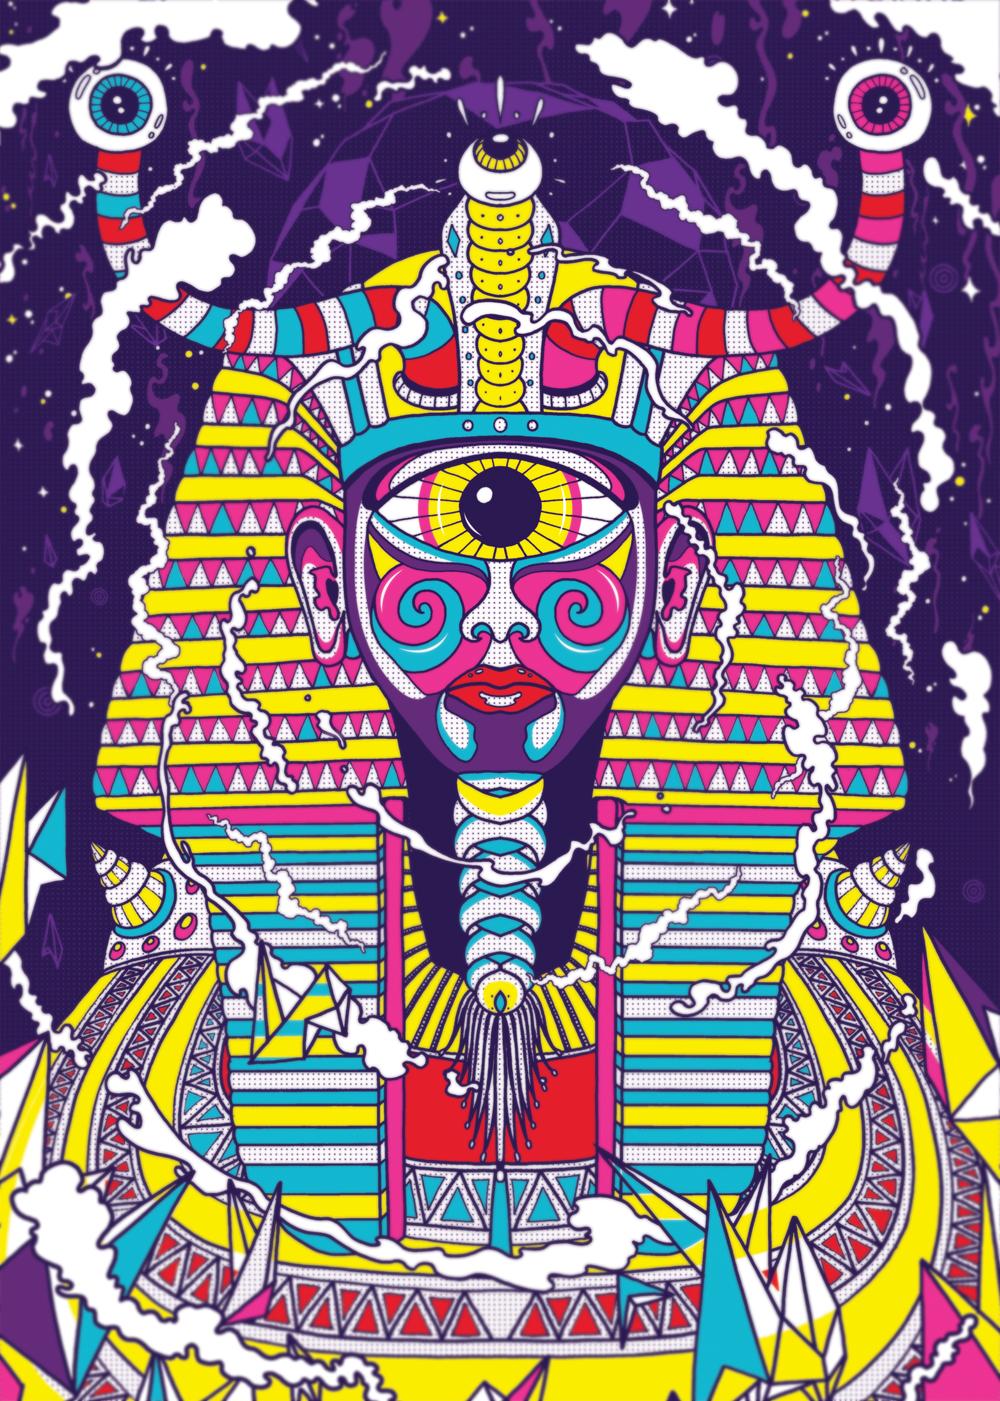 http-cdn-digitalartsonline-co-uk-cmsdata-slideshow-DIGI-ARTS-PSYCHEDELIC-PHARAOH-FINAL-jp-wallpaper-wp5008752